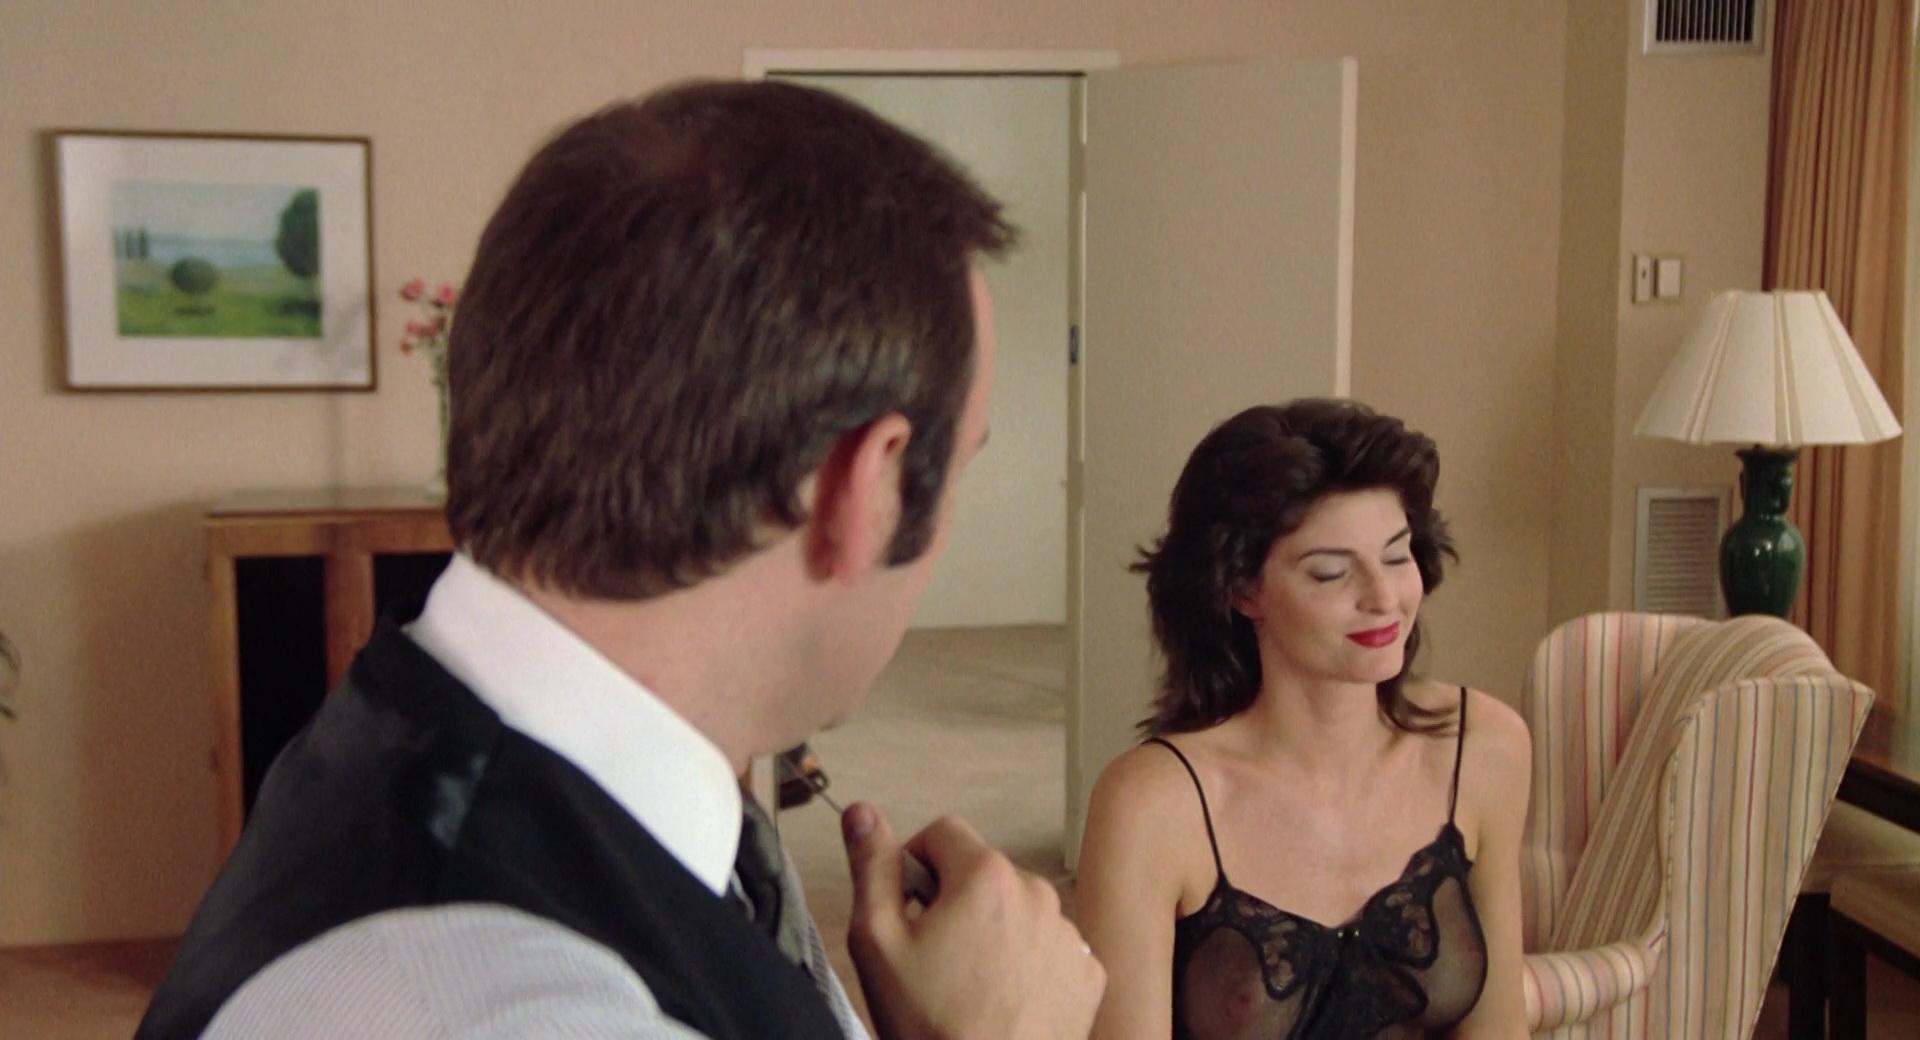 Joan Severance Sex Movies watch online - joan severance – see no evil hear no evil